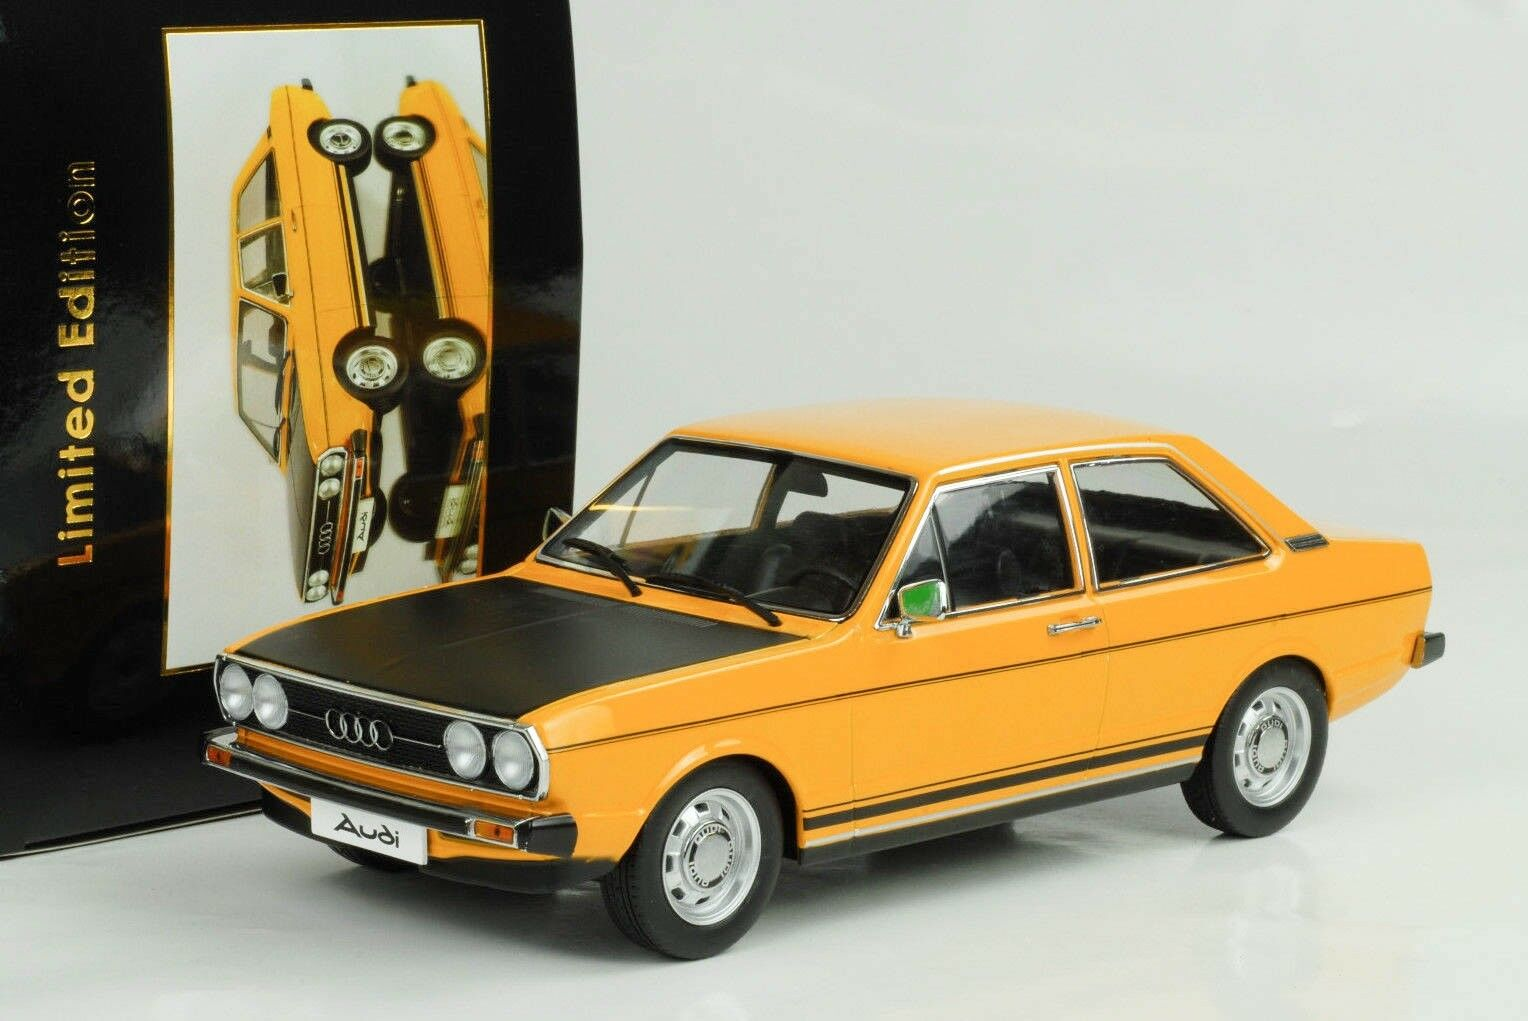 AUDI b1 80 GTE 1975 OCRA cappa nera 1 18 KK Diecast